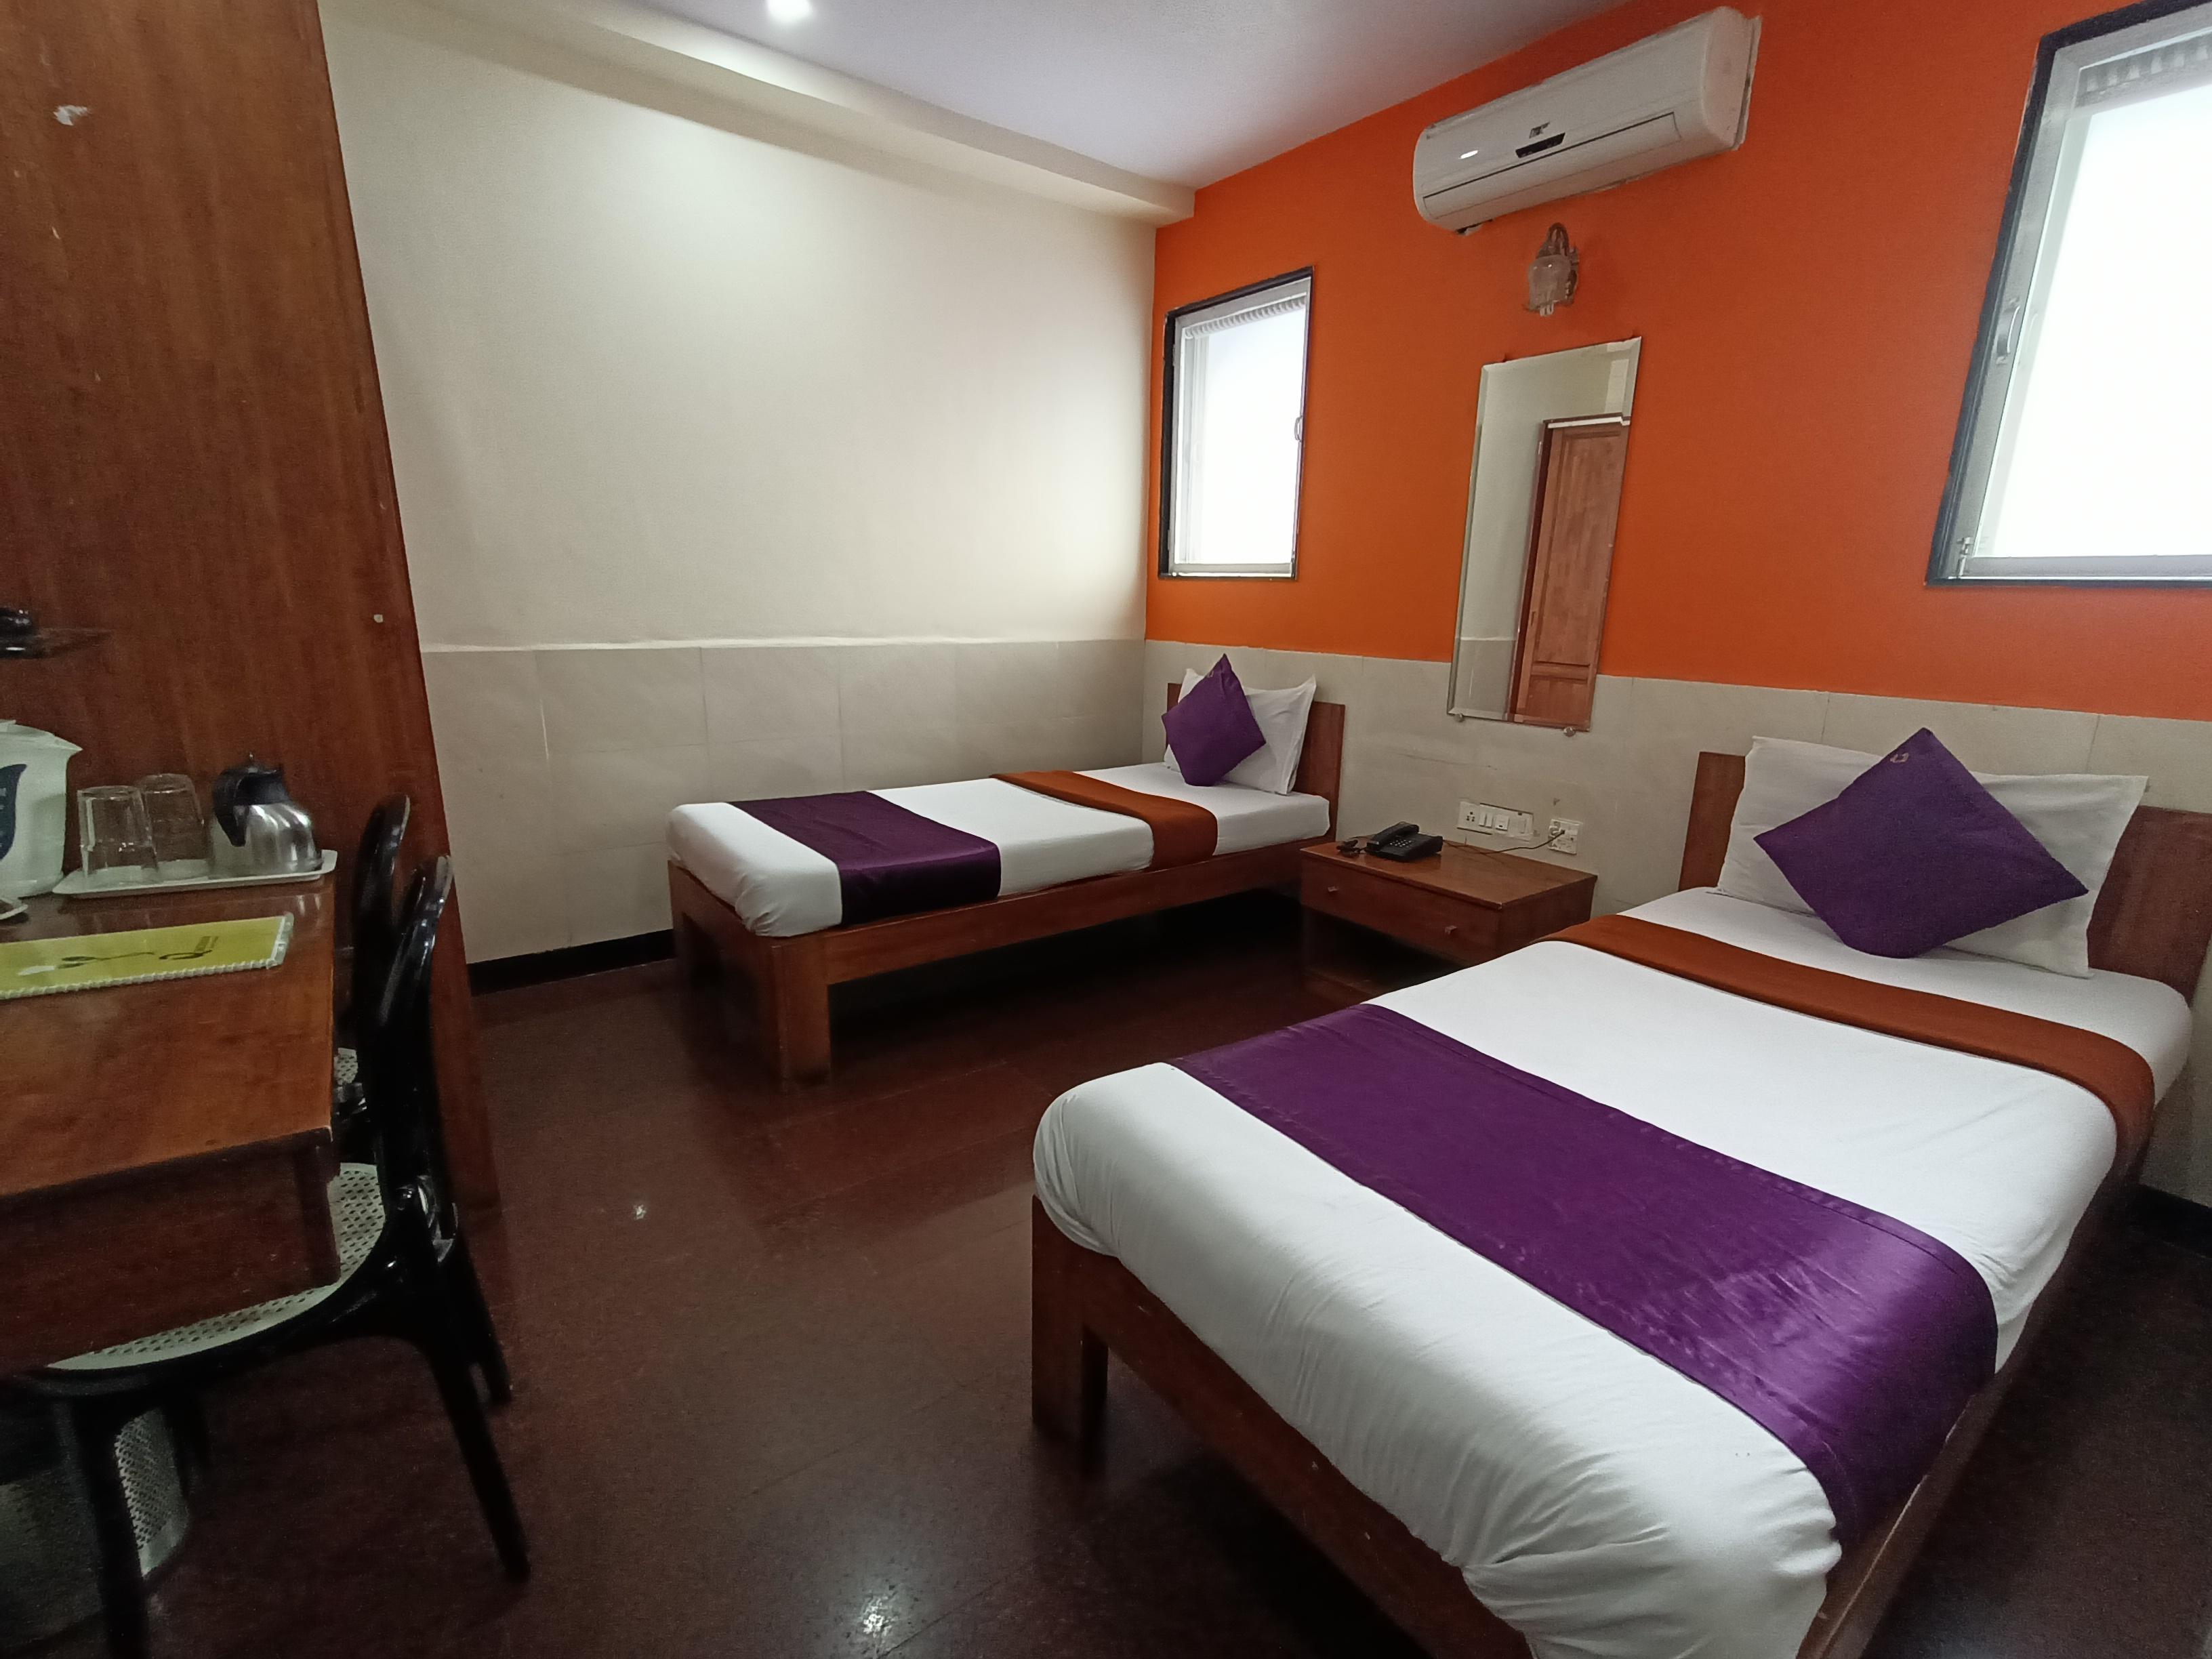 Hotel-Q-Deck-Mumbai-Ville-Parle-Airport